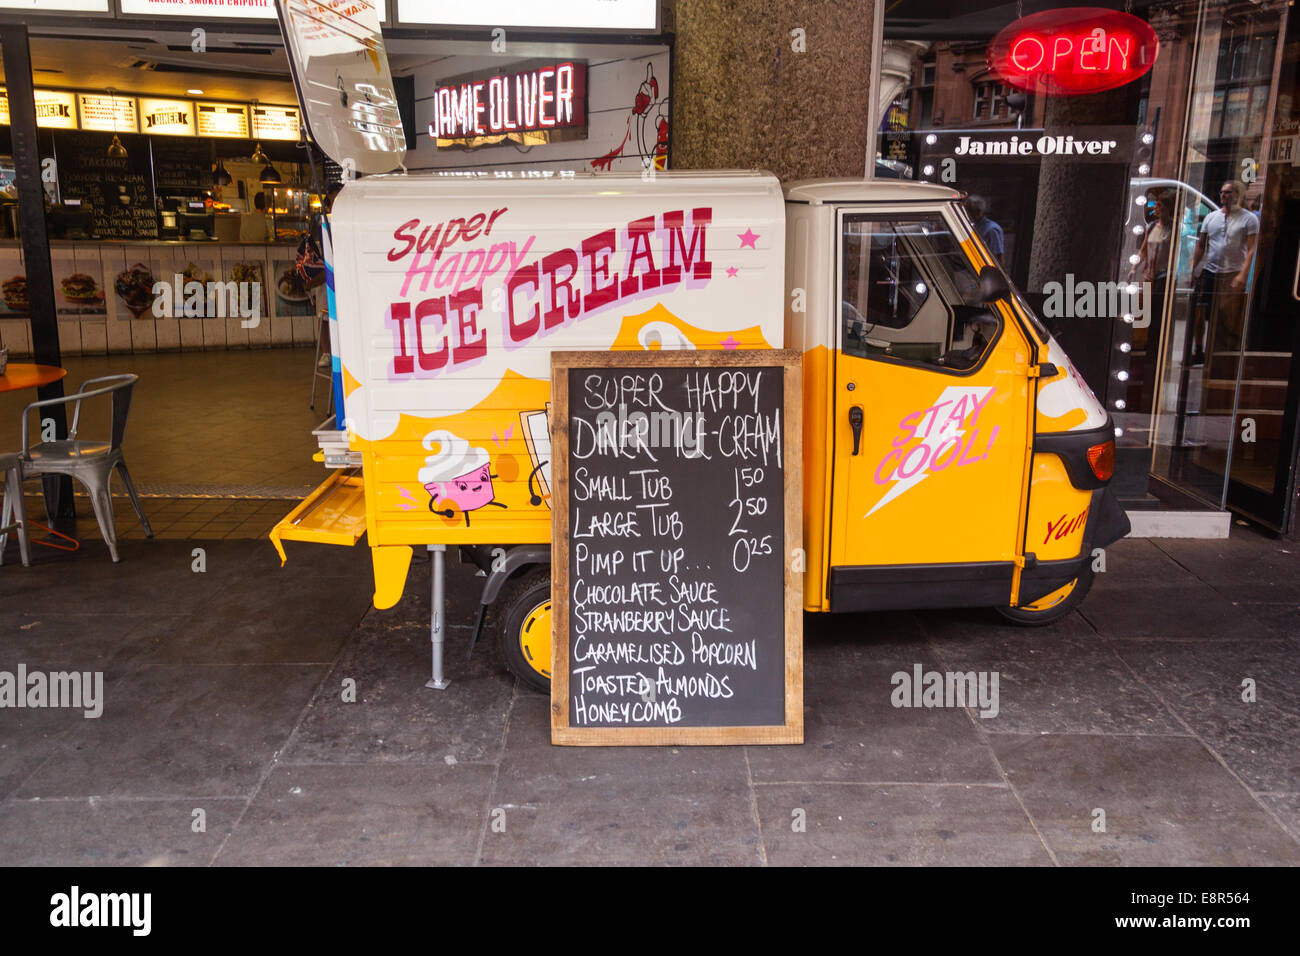 Vespa Piaggio ape ice cream truck, Shaftesbury avenue, London, England, United Kingdom. - Stock Image